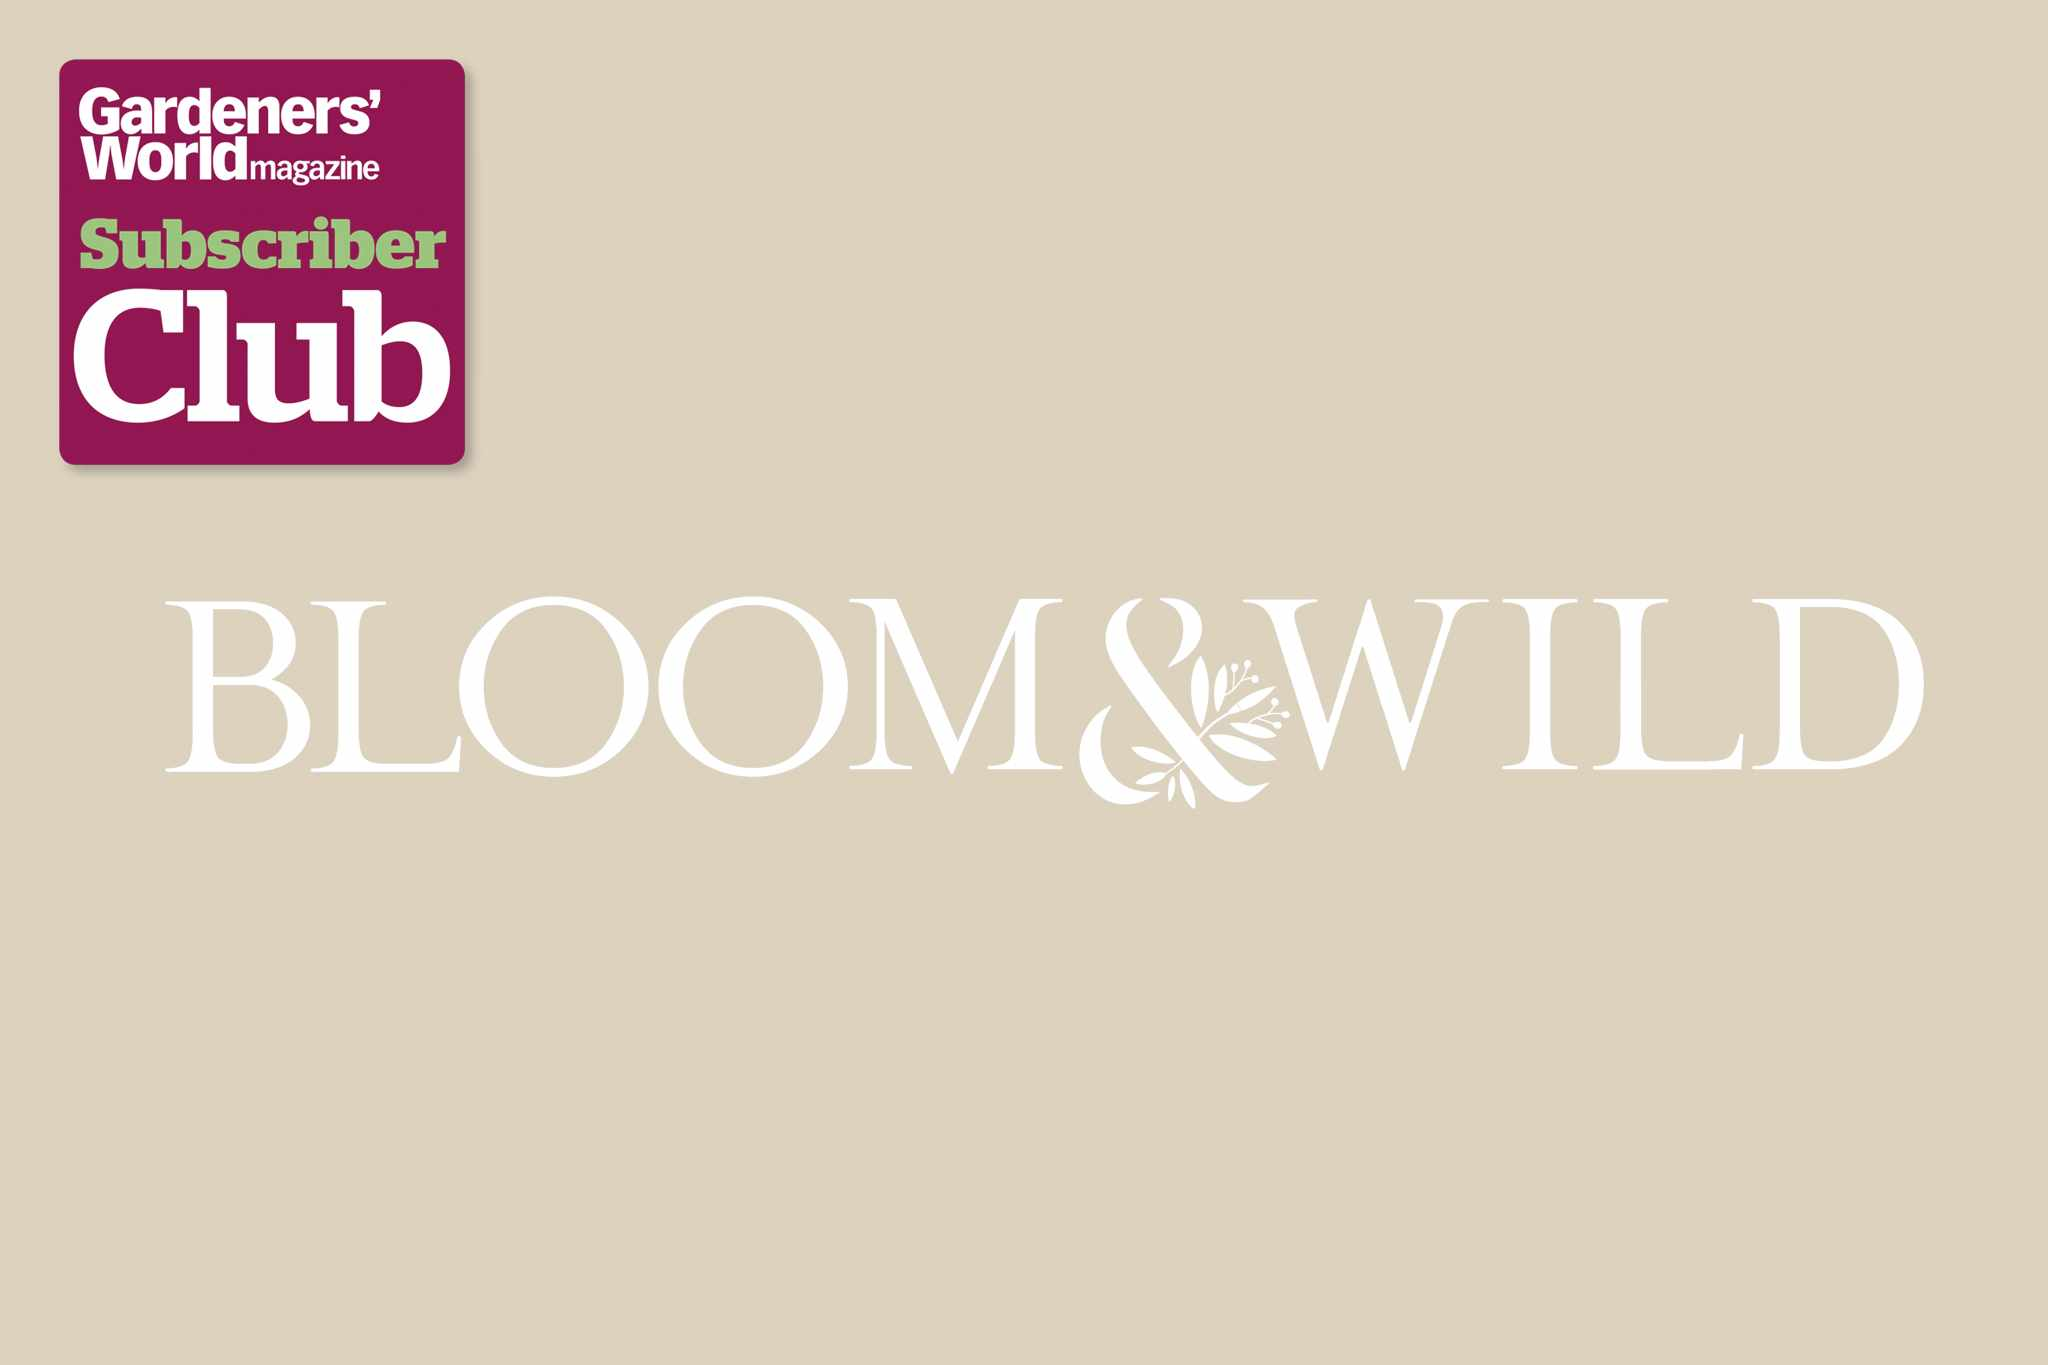 Bloom & Wild BBC Gardeners' World Magazine Subscriber Club discount